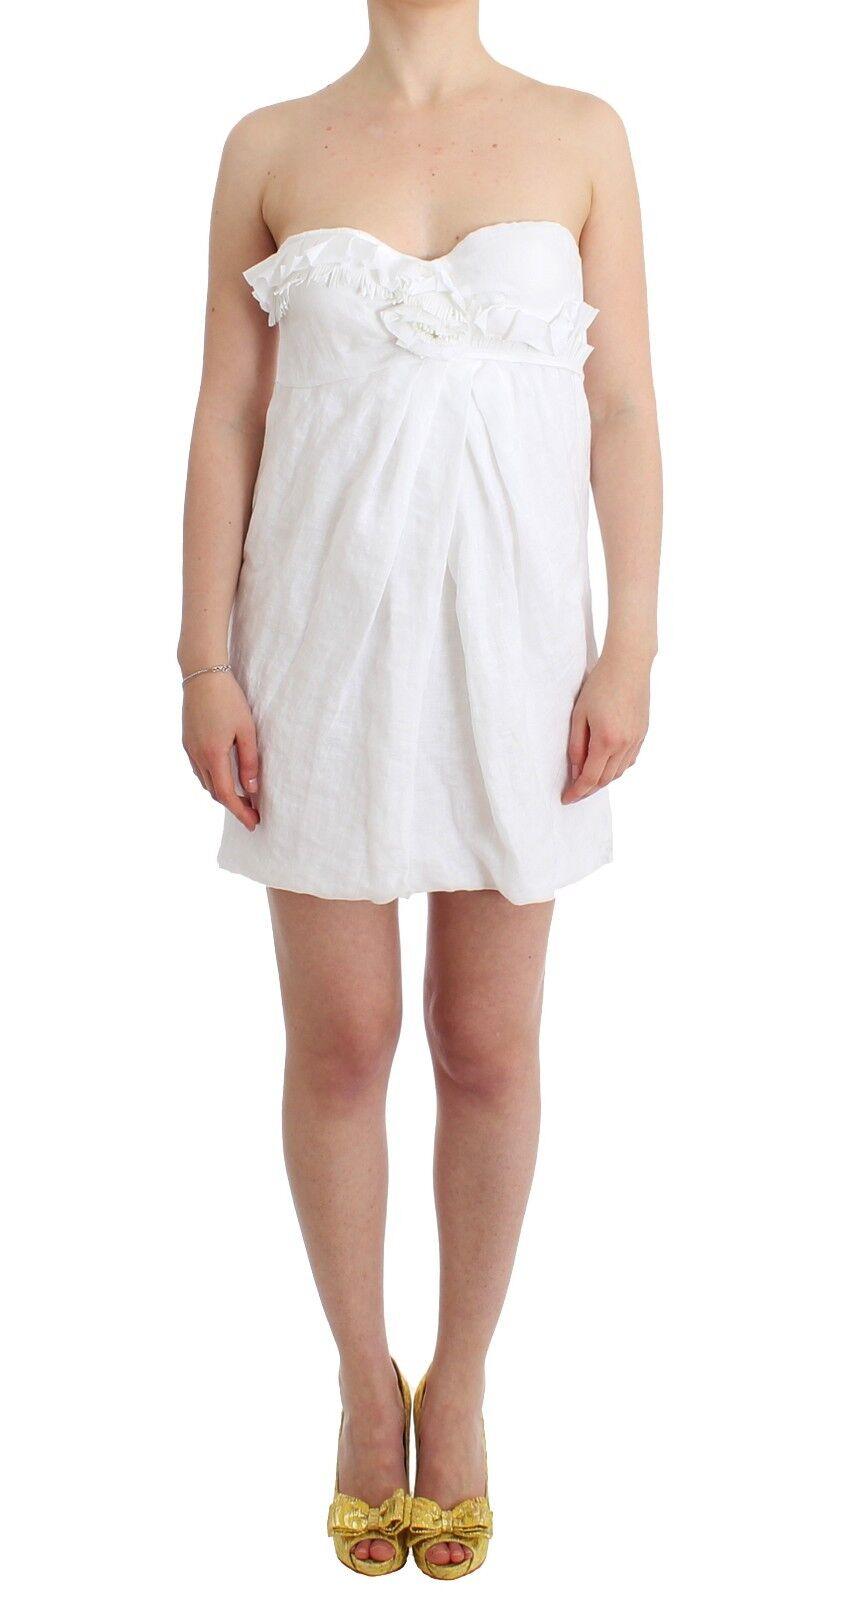 NEW  Ermanno Scervino Dress Beachwear Weiß Beach Bustier Mini IT40 USXS